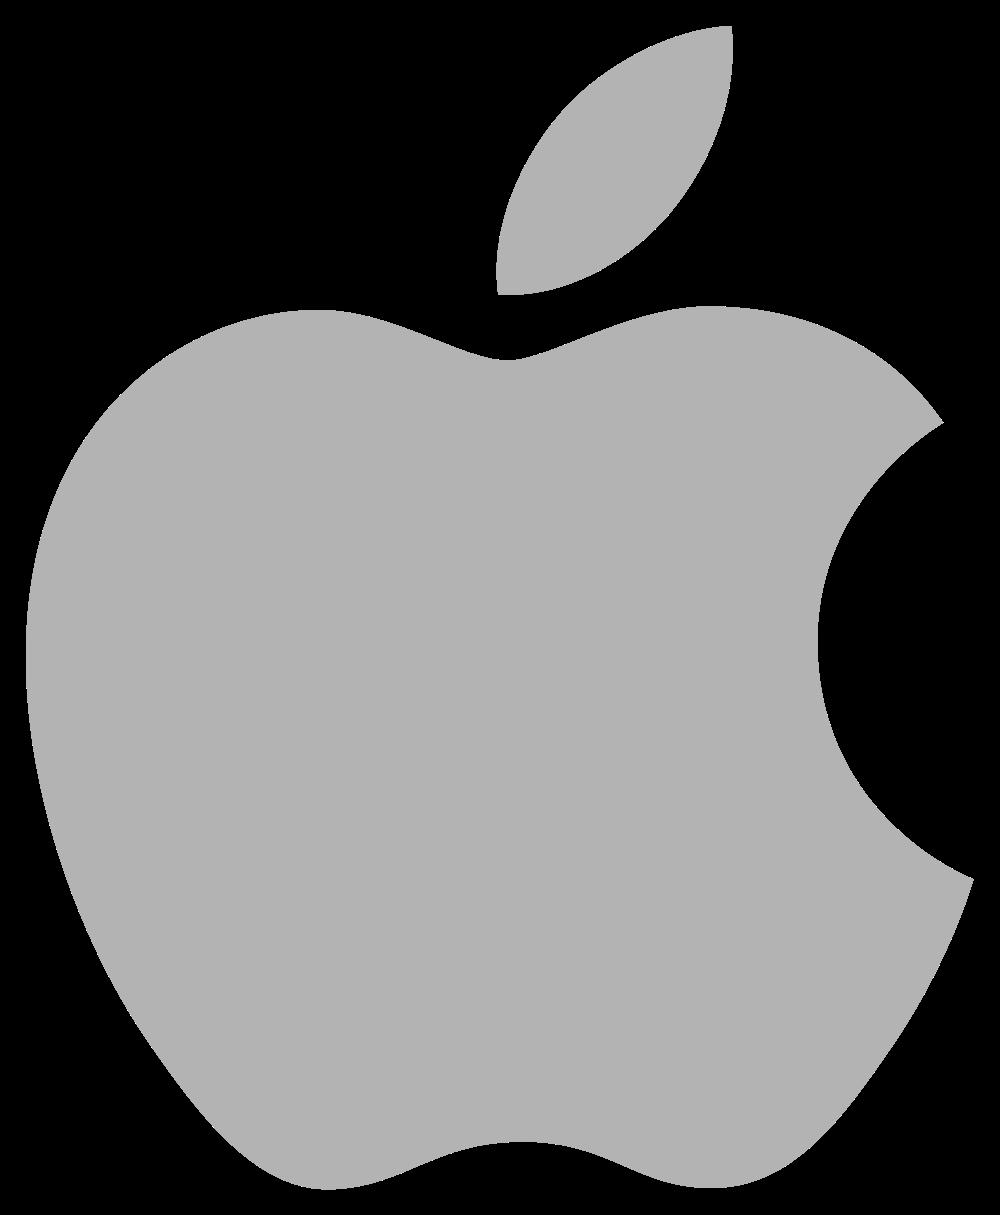 apple_logo_PNG19670 10